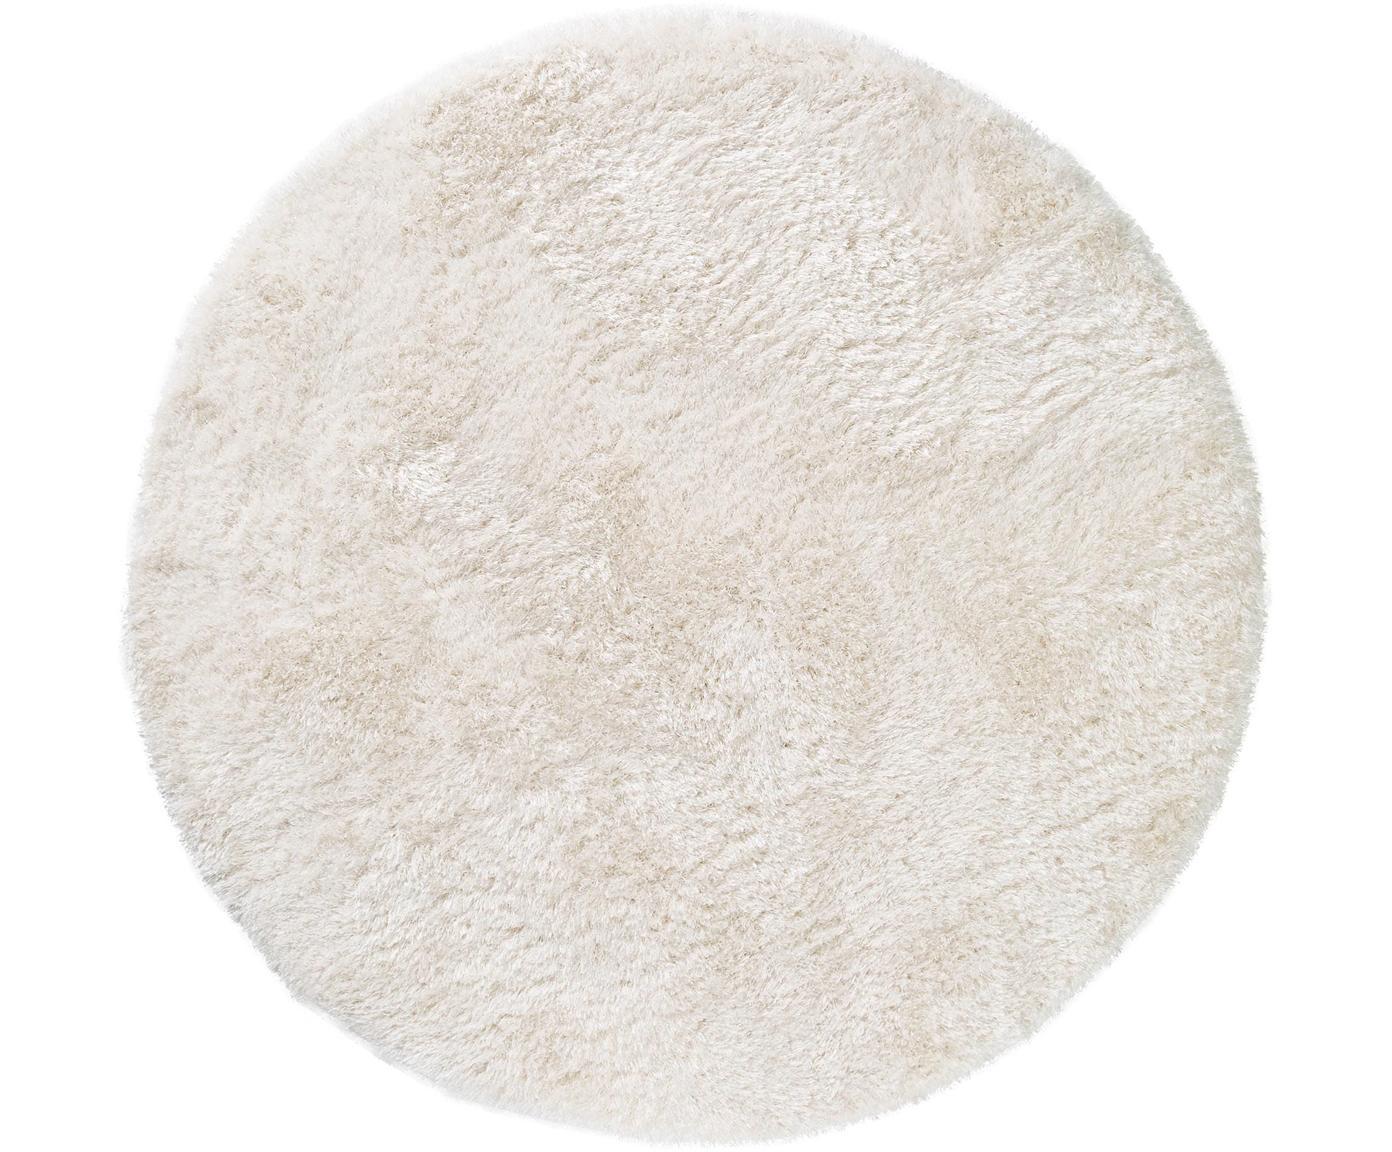 Glanzend hoogpolig vloerkleed Lea, rond, 50% polyester, 50% polypropyleen, Wit, Ø 120 cm (maat S)